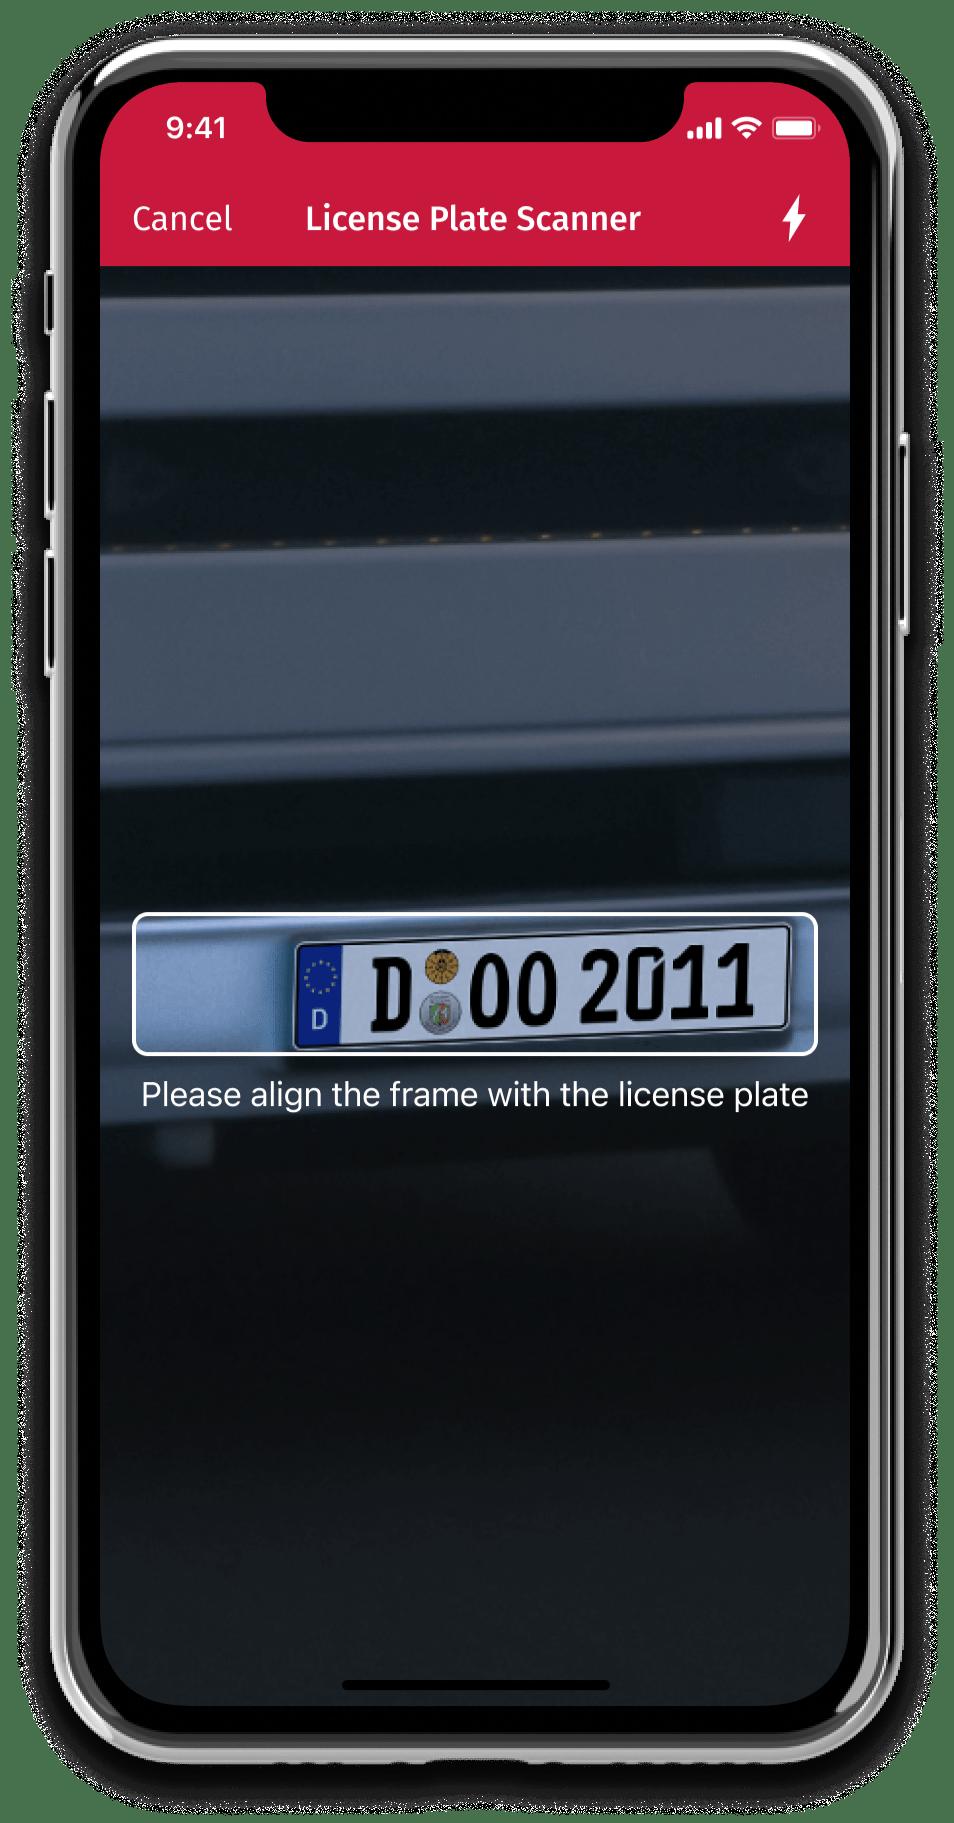 Scanbot SDK scan license plates